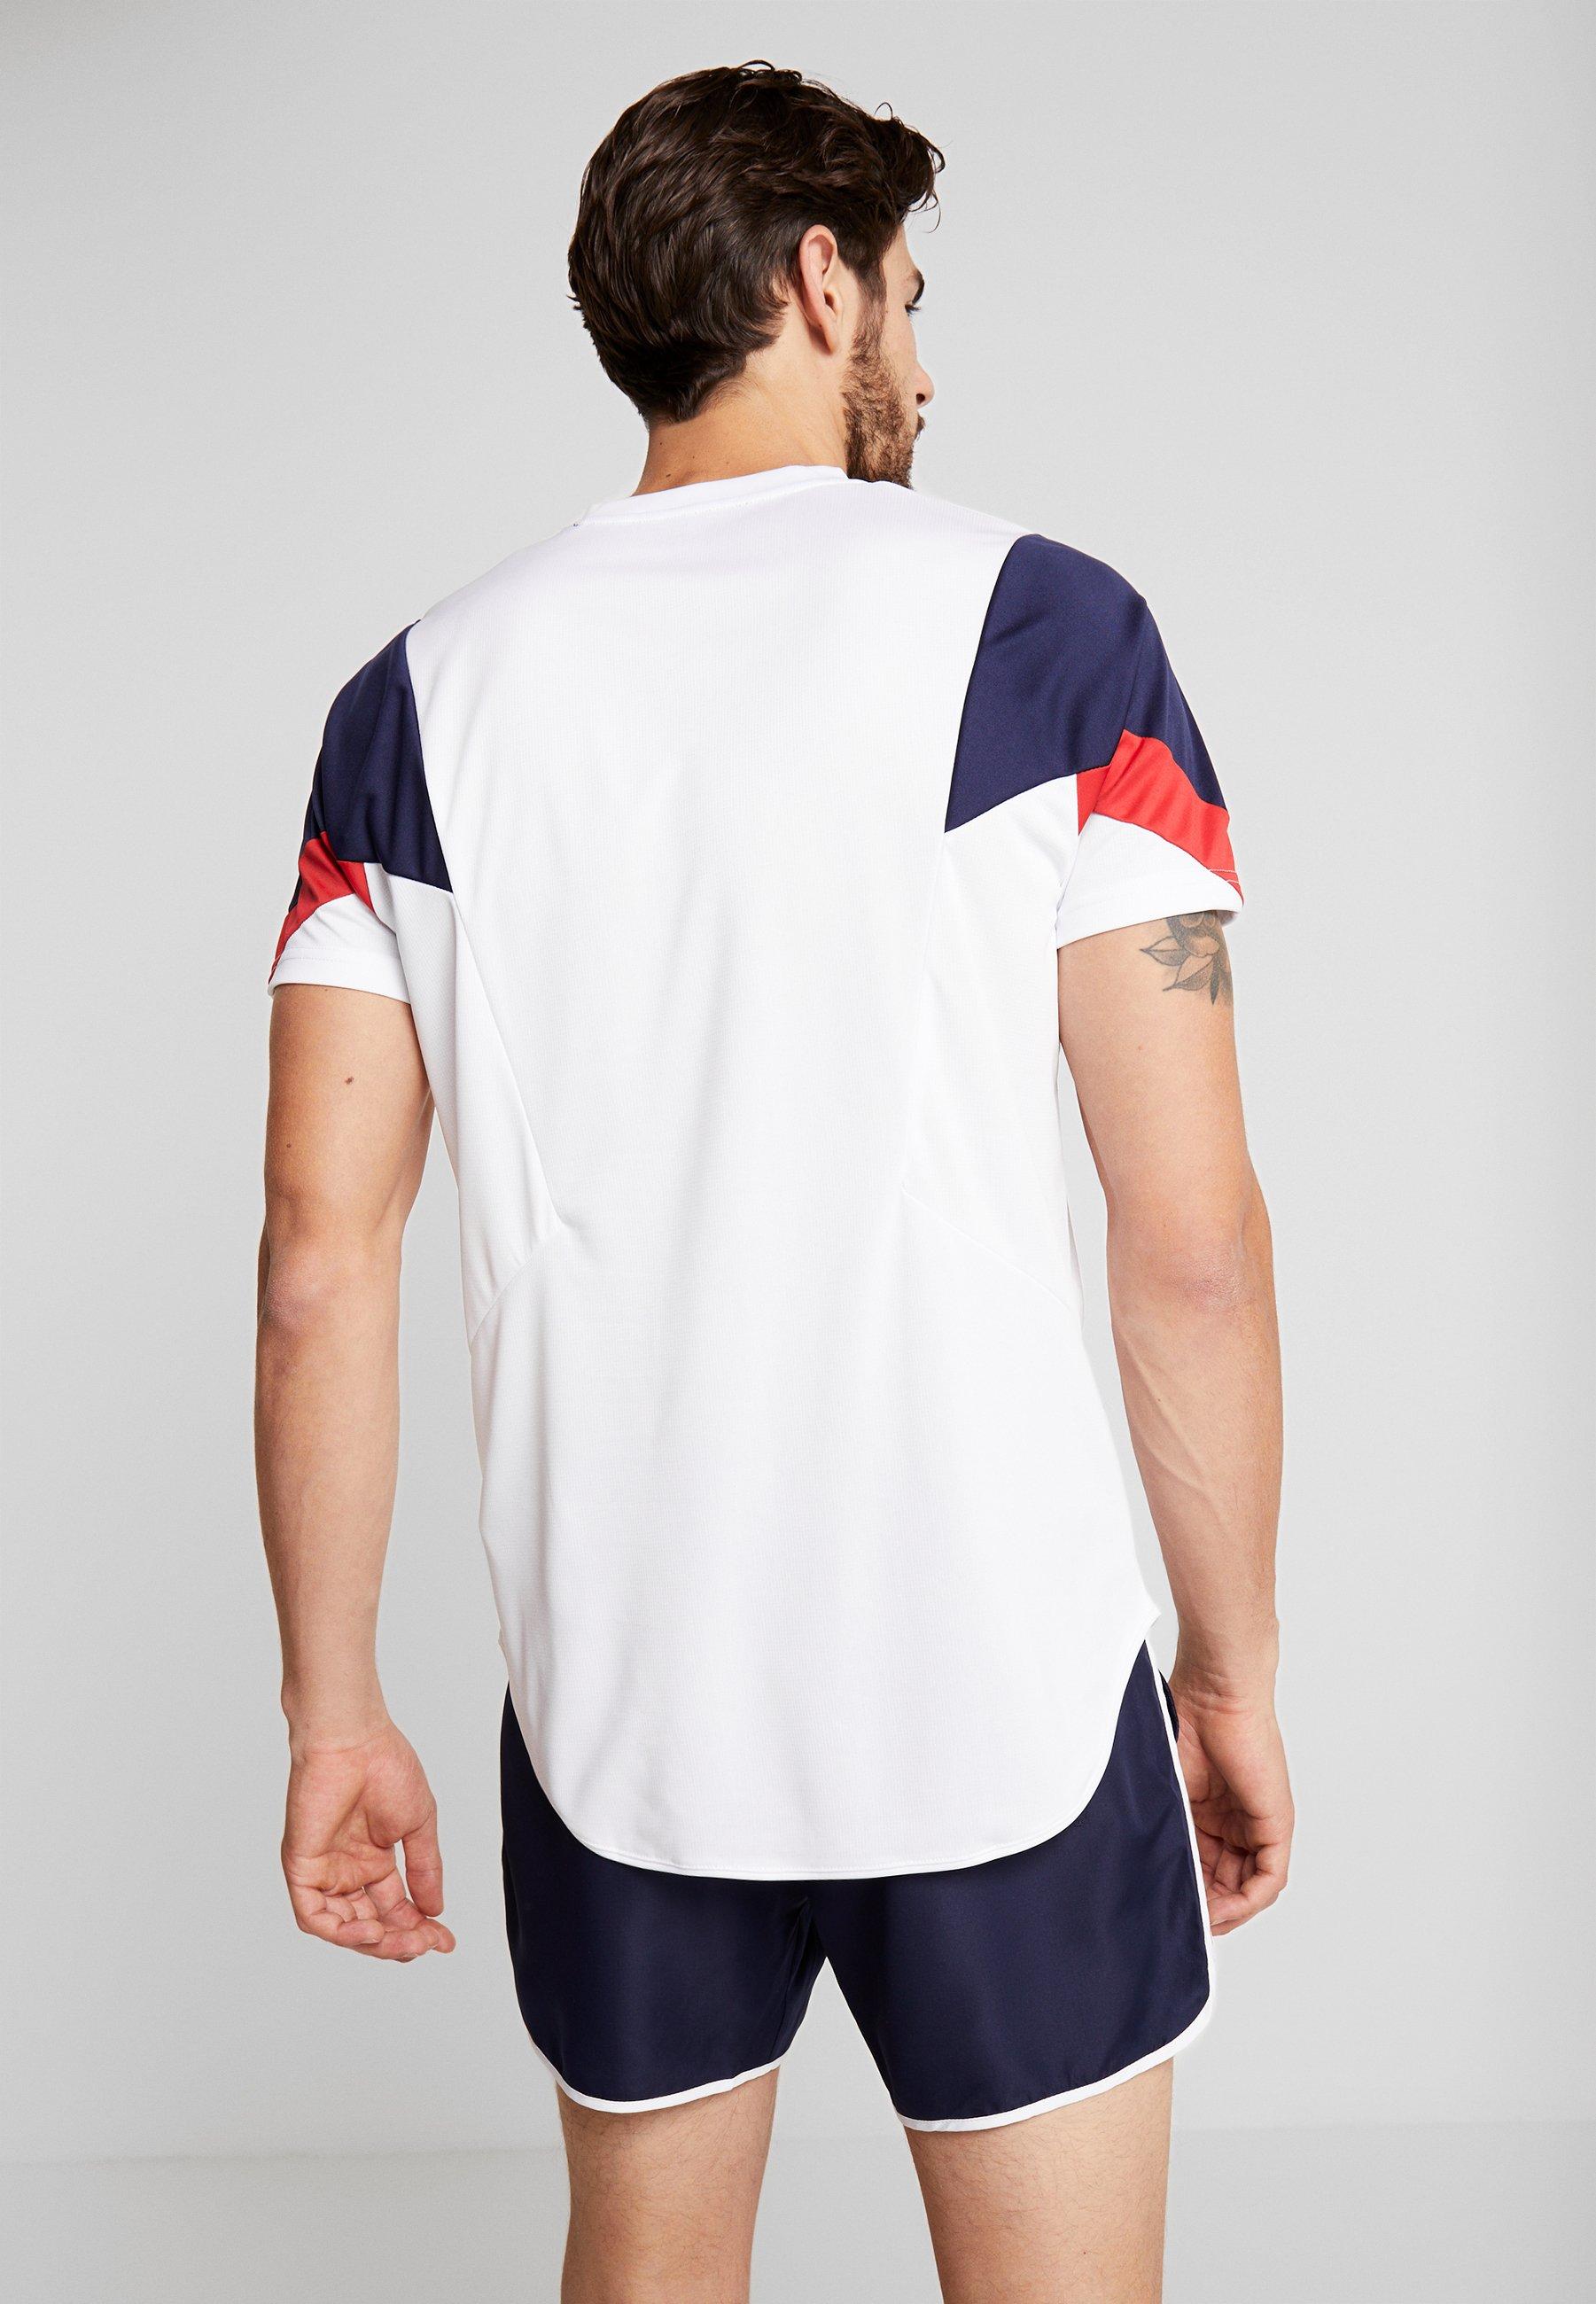 shirt BeasleyT Imprimé Ellesse White TlFcJuK13